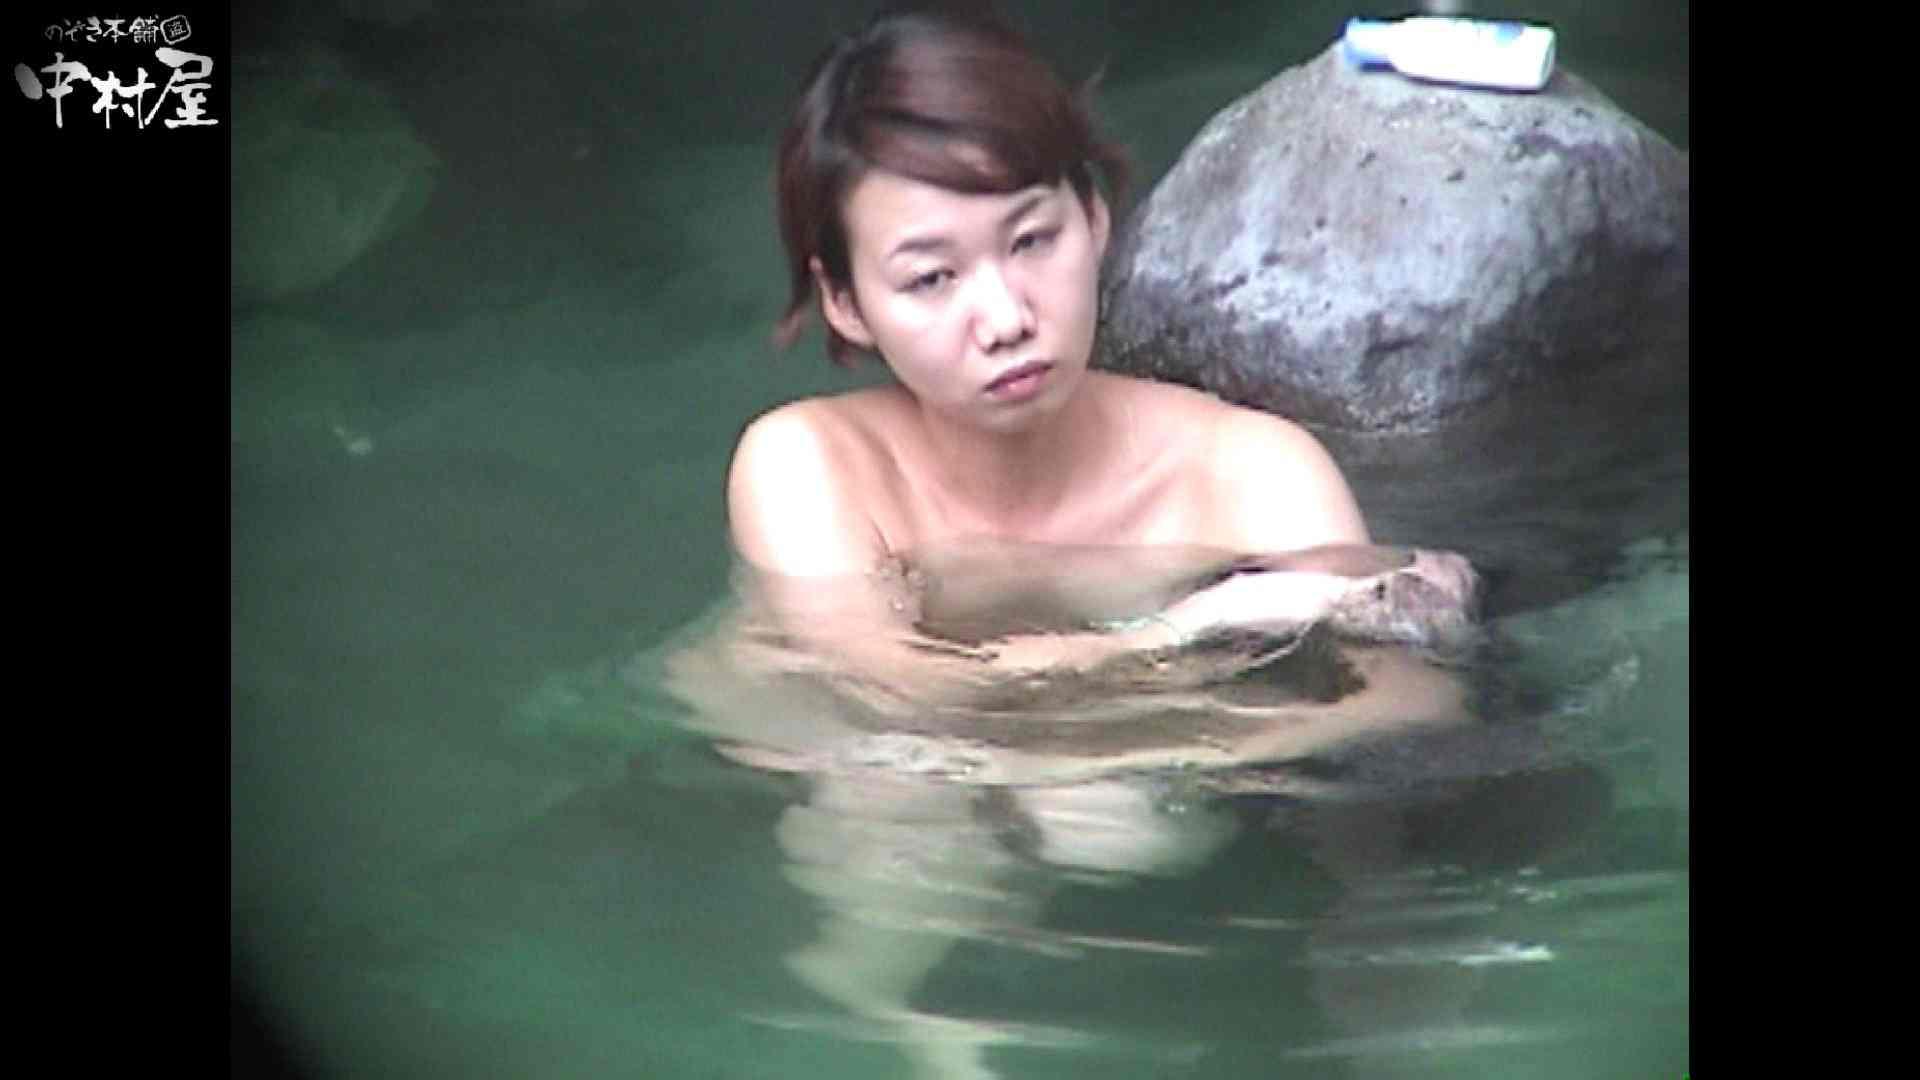 Aquaな露天風呂Vol.951 盗撮映像  93Pix 29